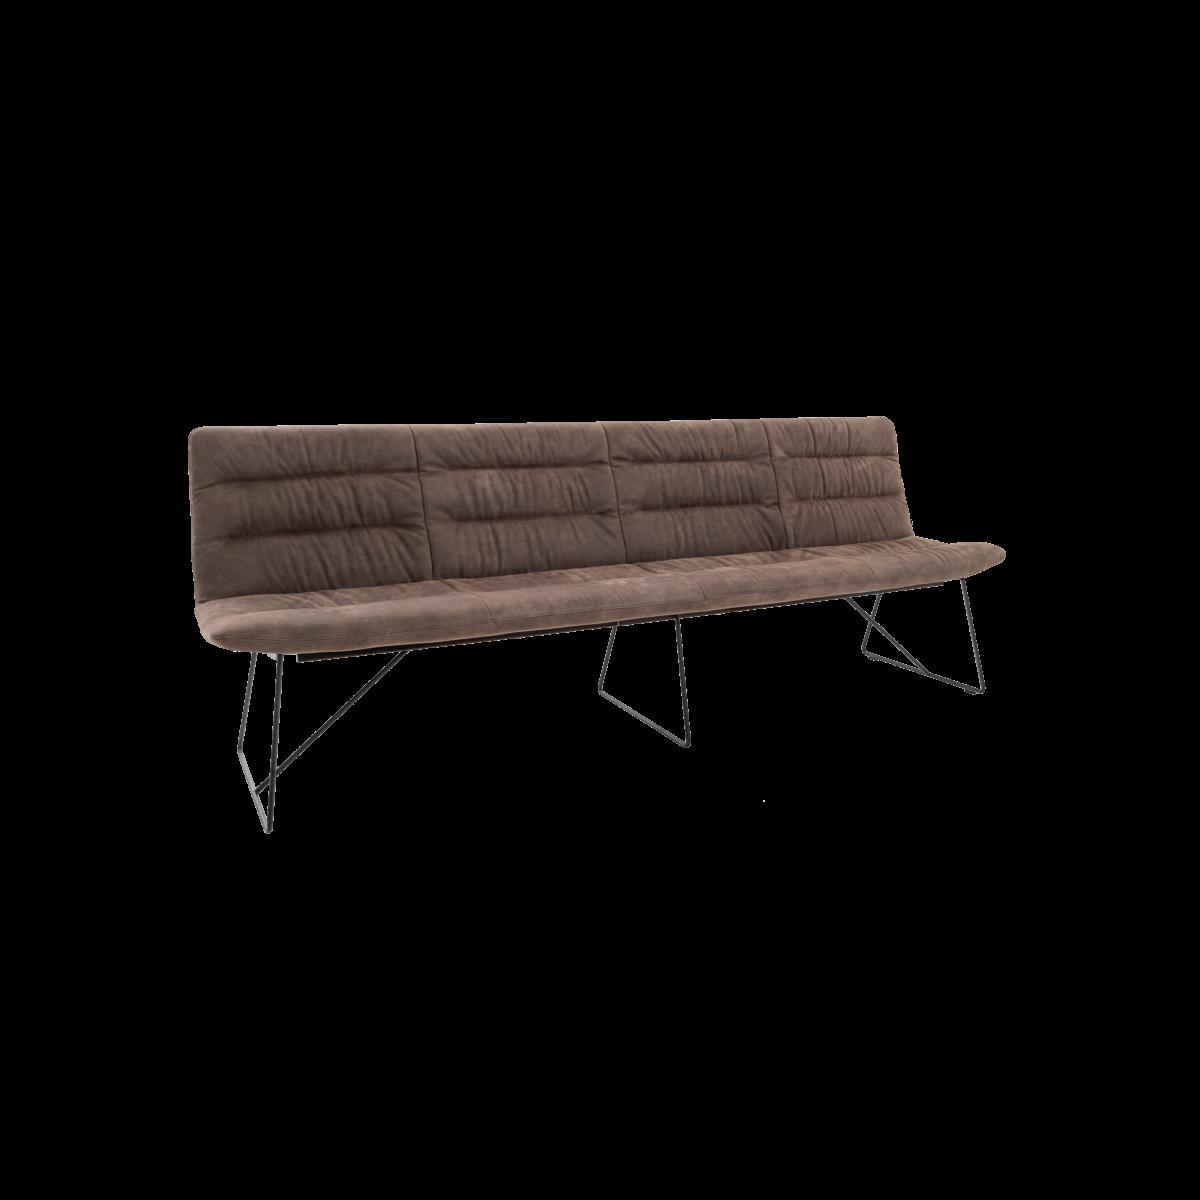 ARVA LIGHT BENCH 4er bench kuf oA pol brown KFF  1 1200x1200 - Bancheta Arva Light KFF